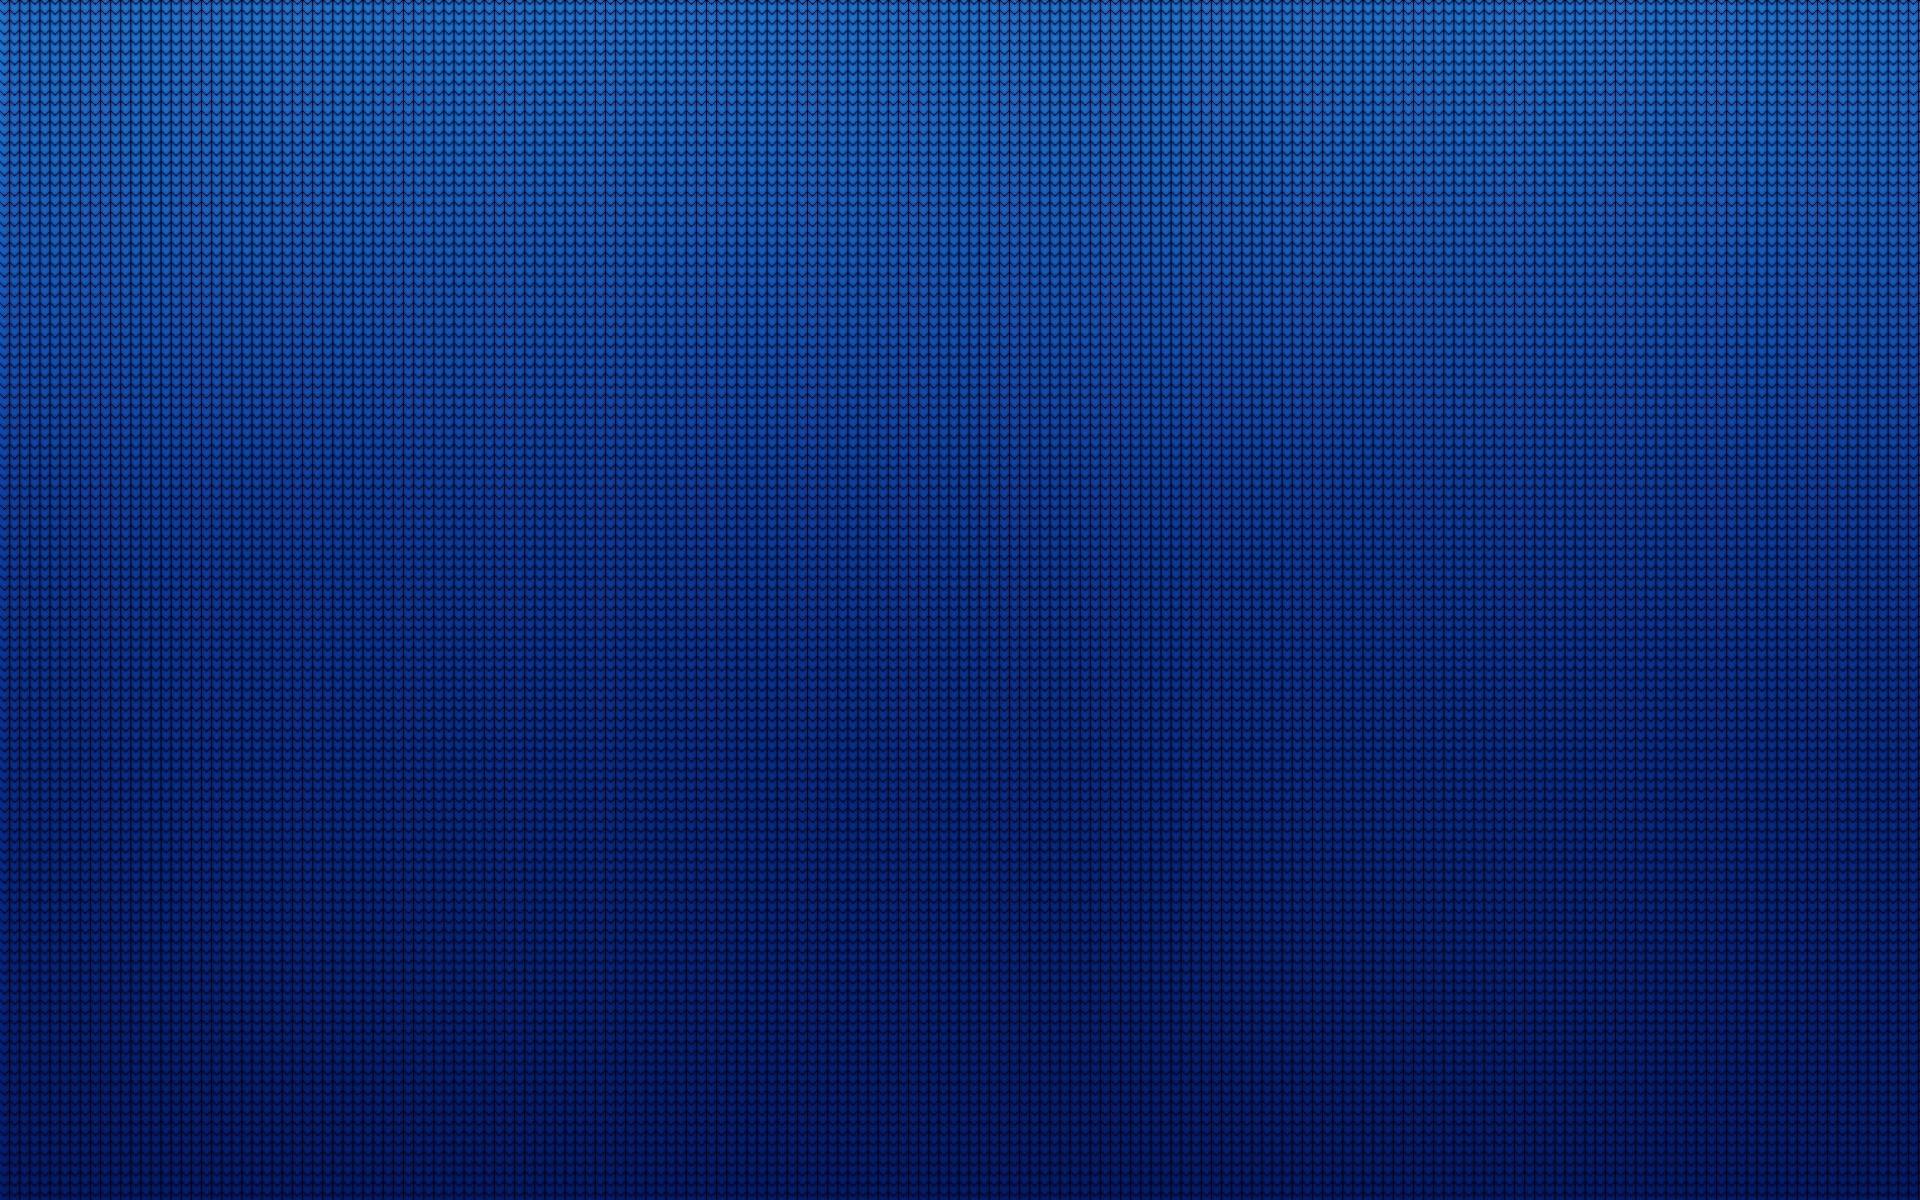 Dark blue checks web background Daily pics update HD Wallpapers #9042